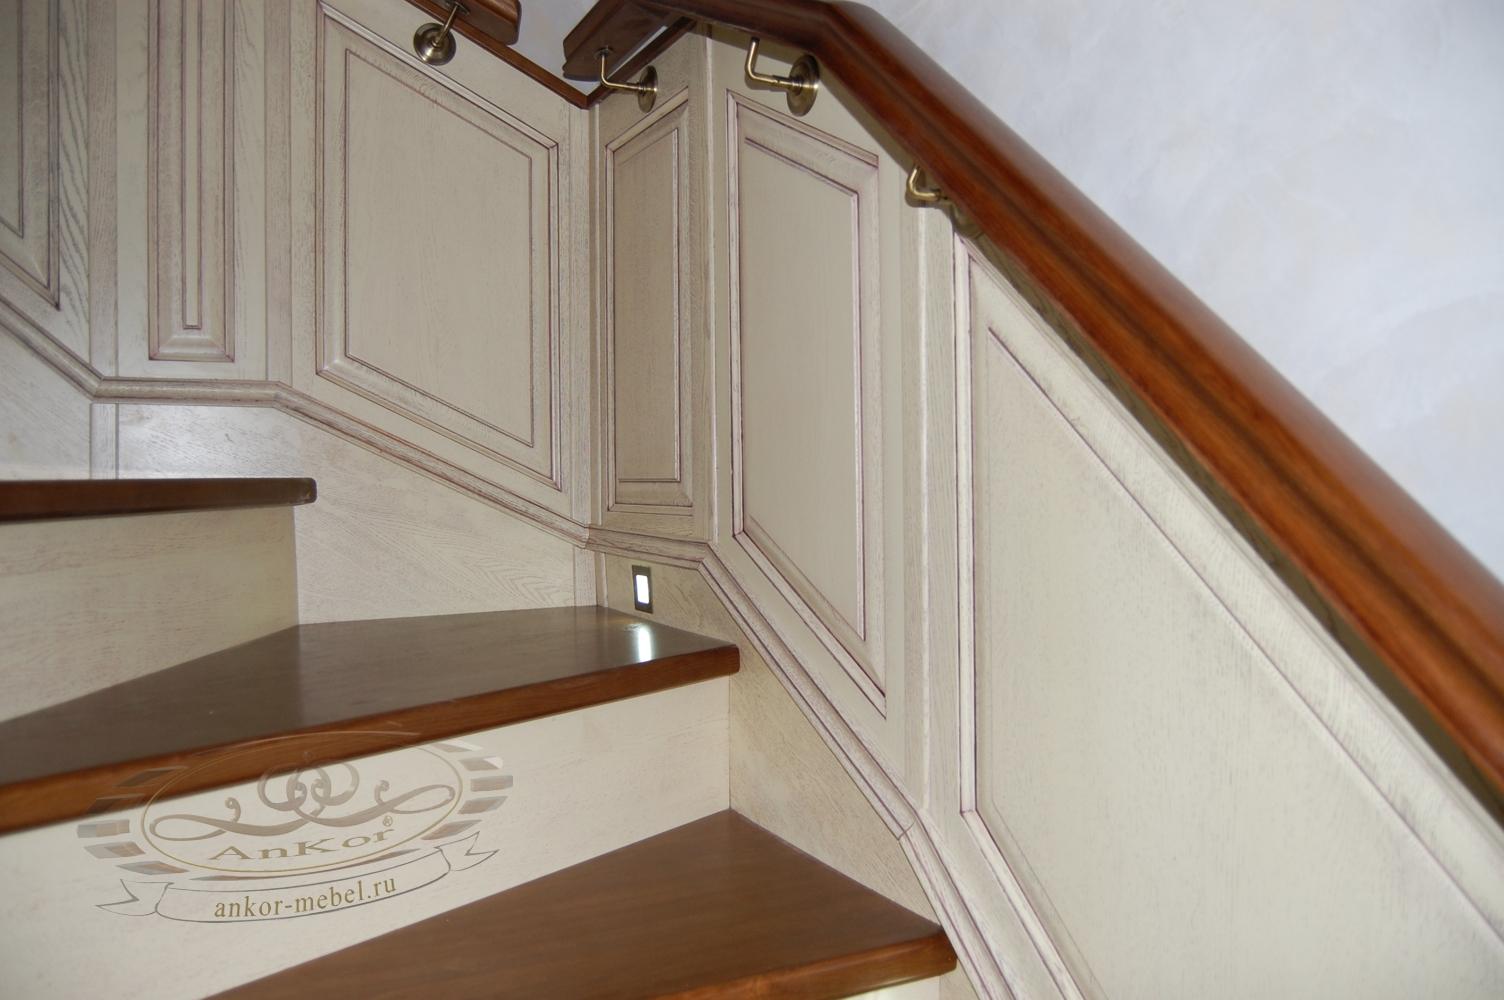 Лестницы0,57